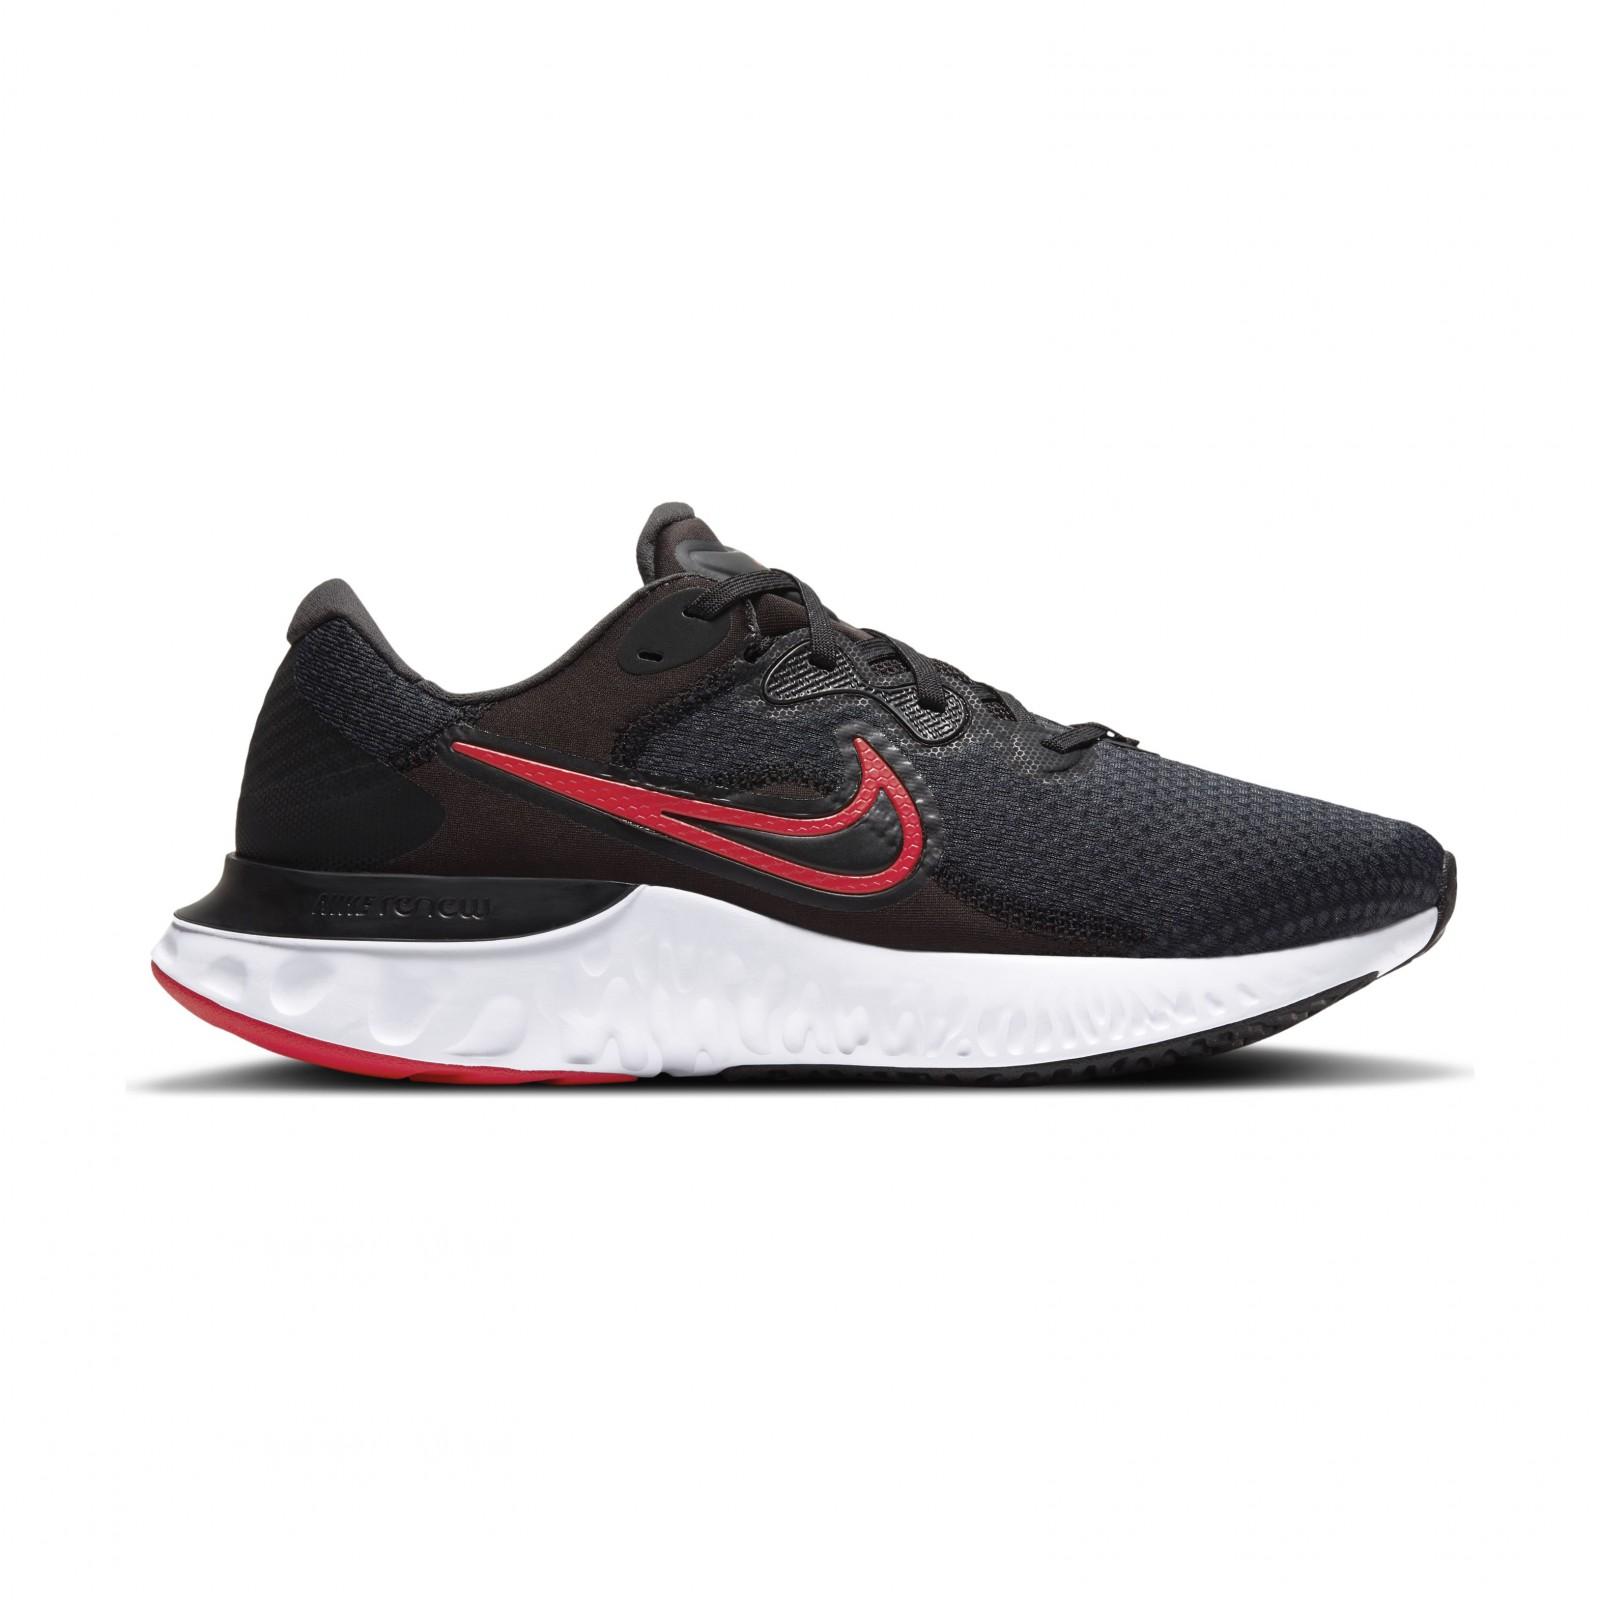 Nike Renew Run 2 BLACK/UNIVERSITY RED-DK SMOKE GREY-WHITE